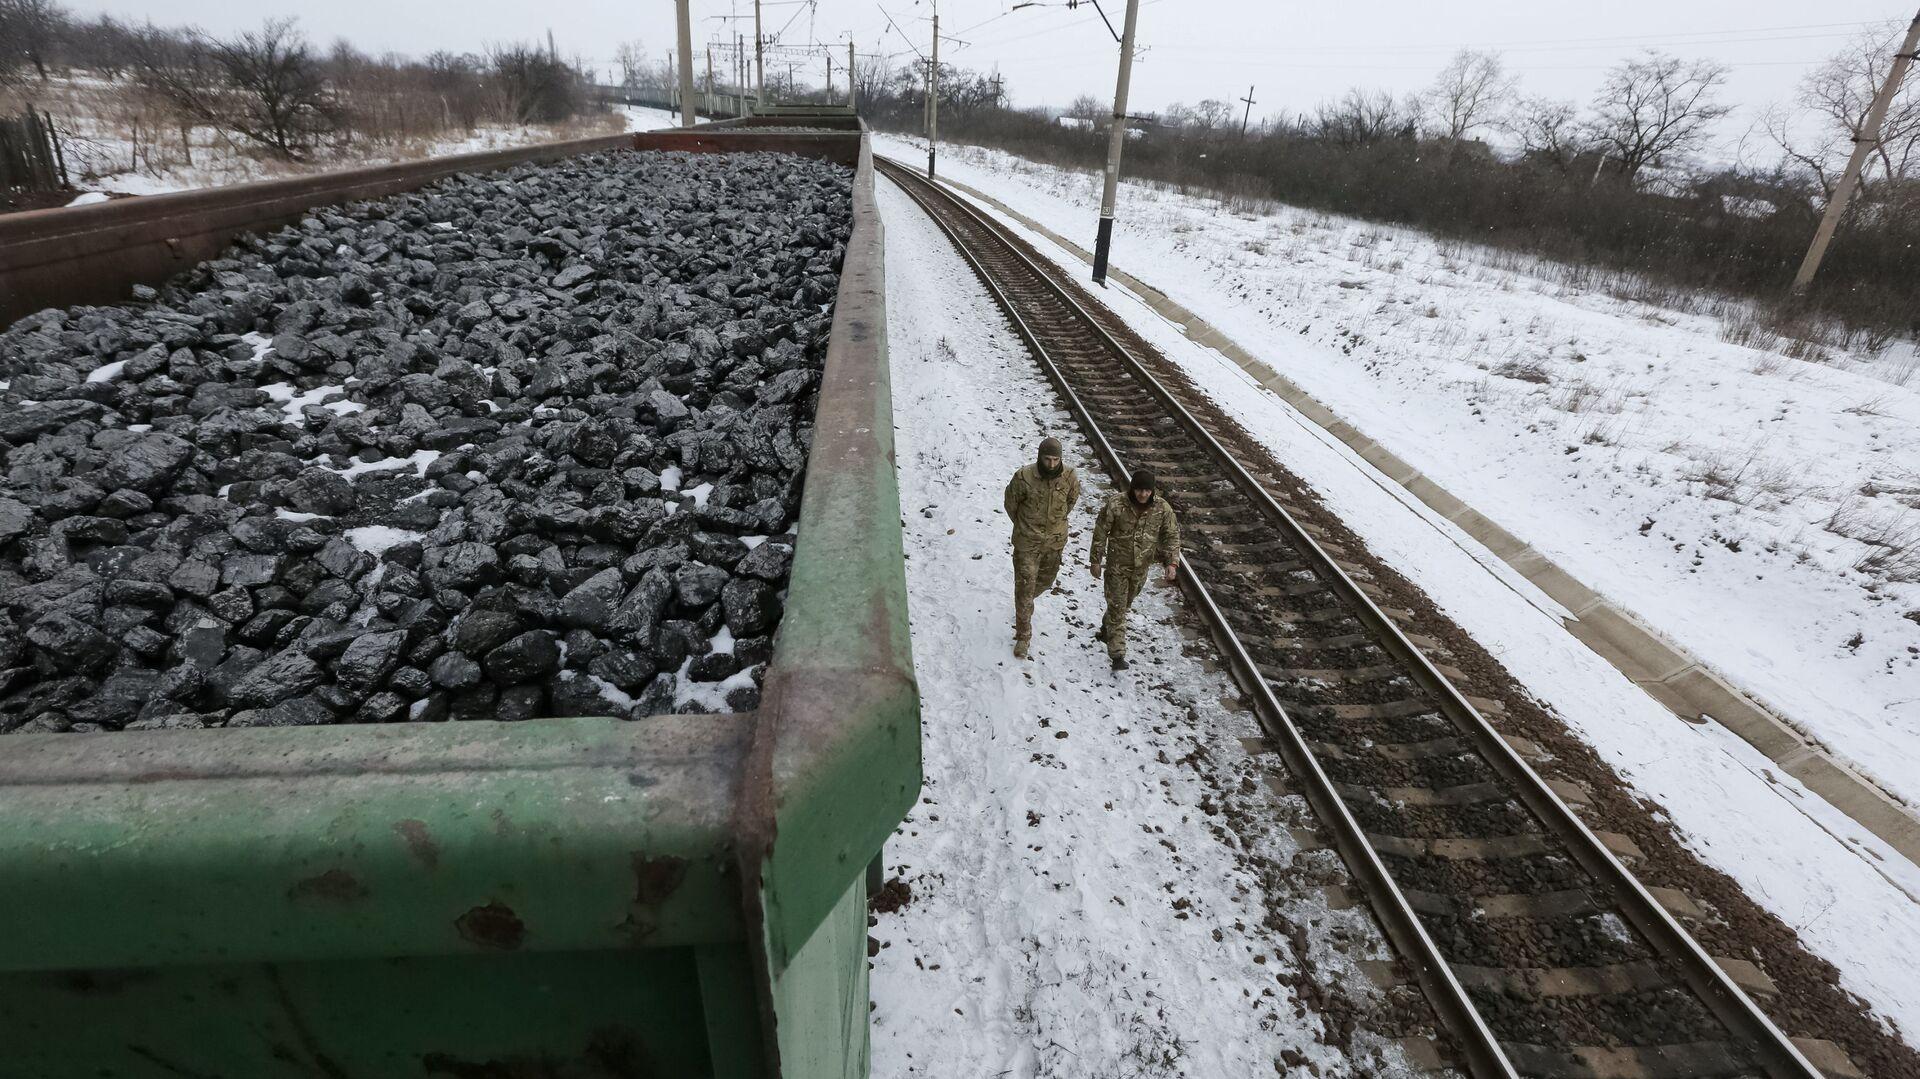 Treni che trasportano carbone - Sputnik Italia, 1920, 12.10.2021